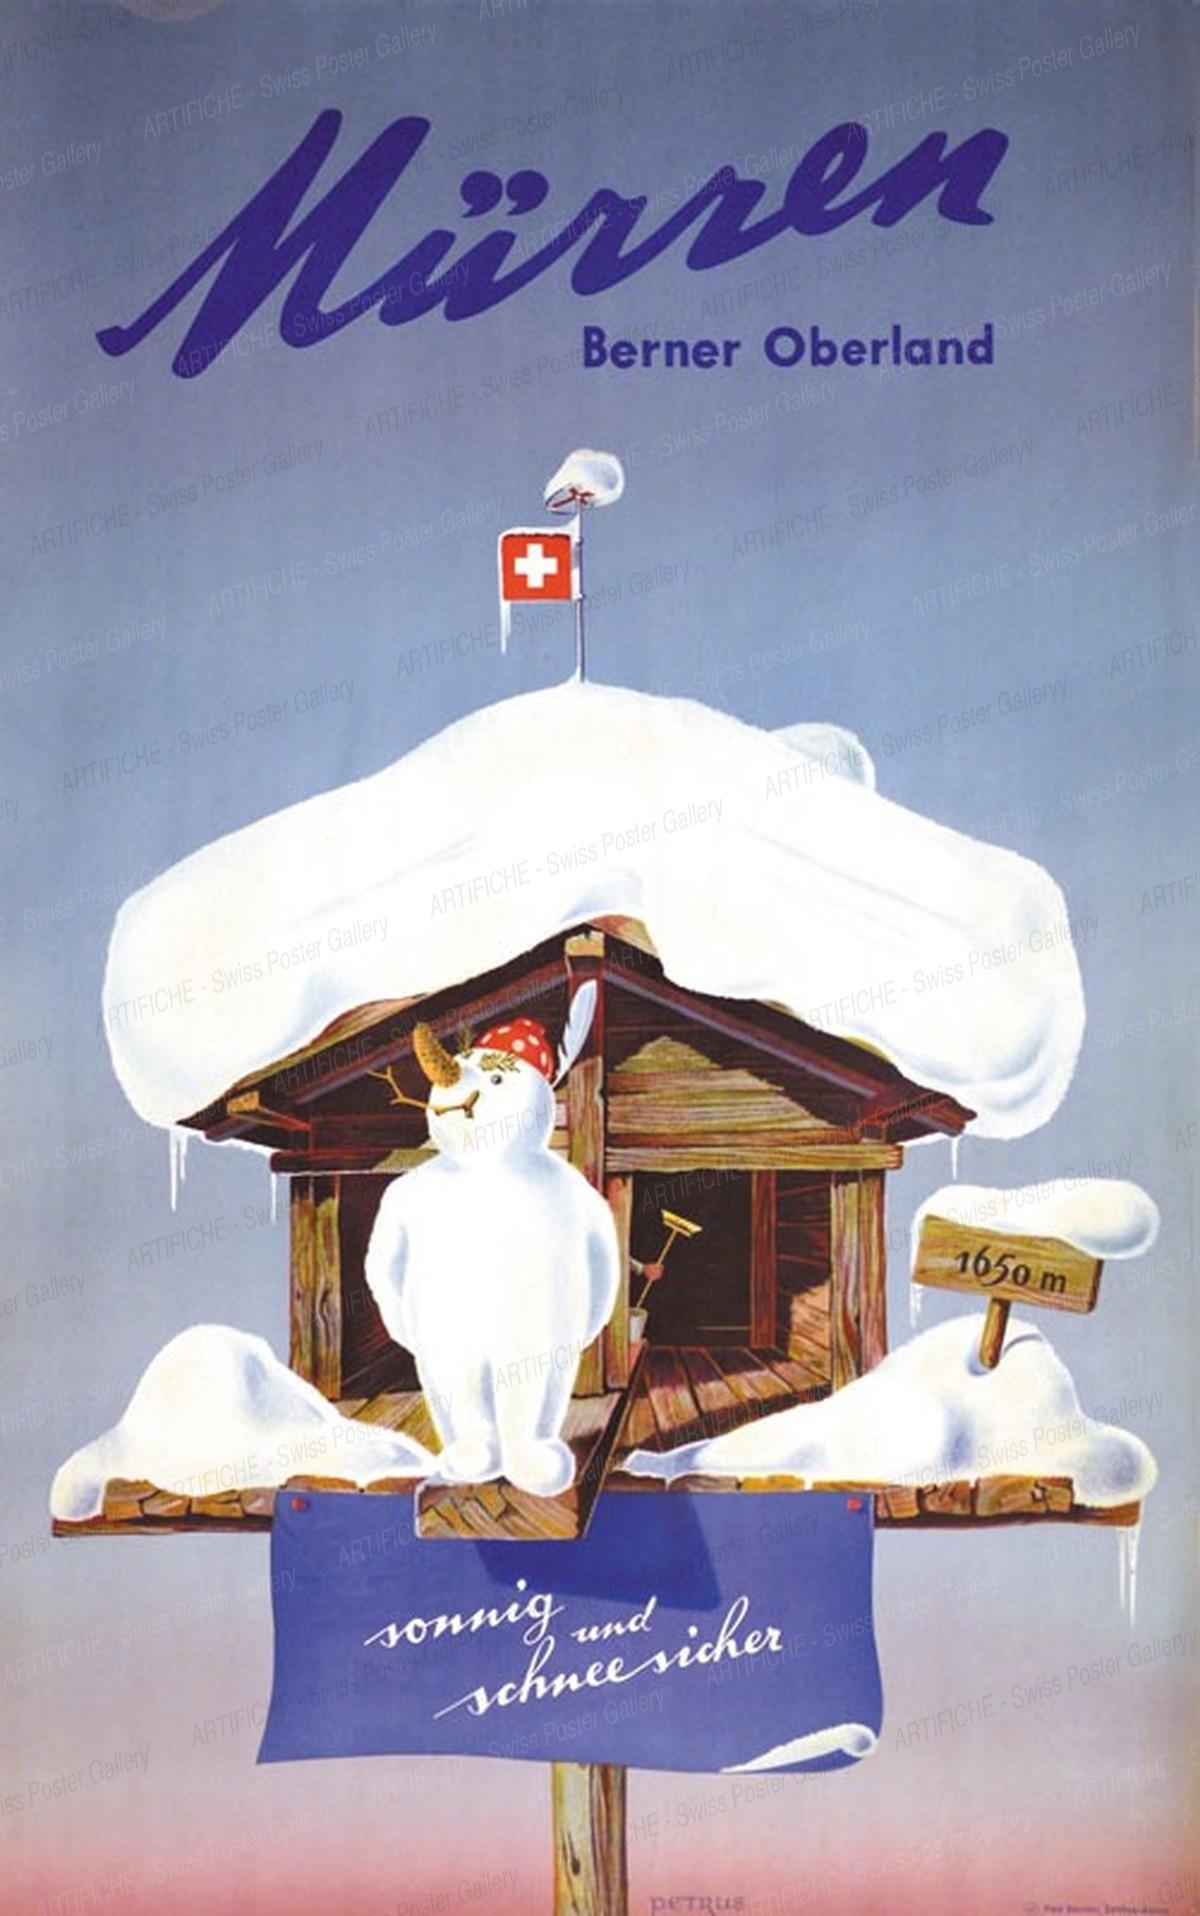 Murren – Bernese Oberland, Petrus